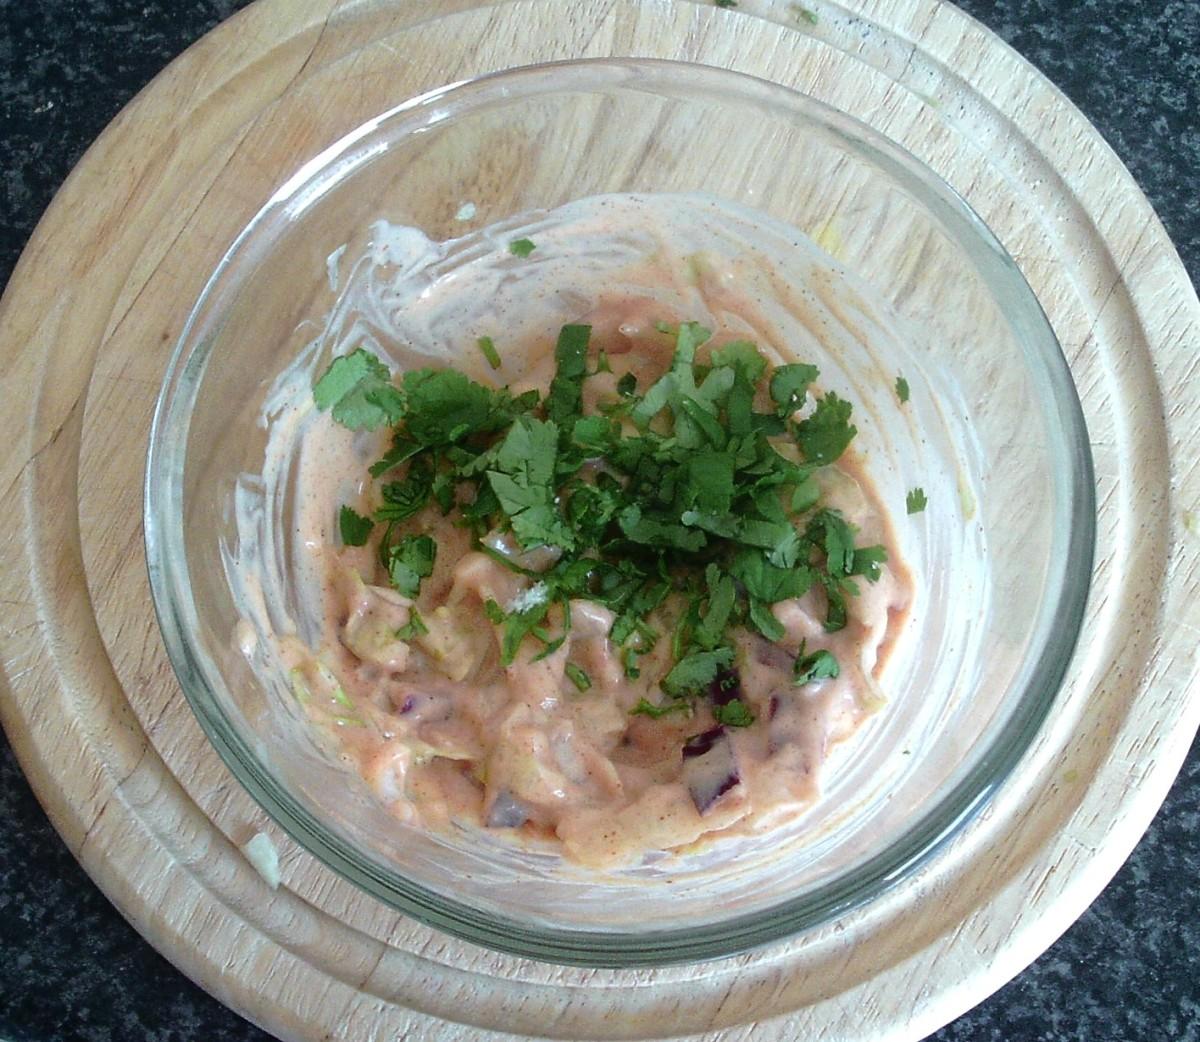 Coriander/cilantro is stirred through chilli sauce